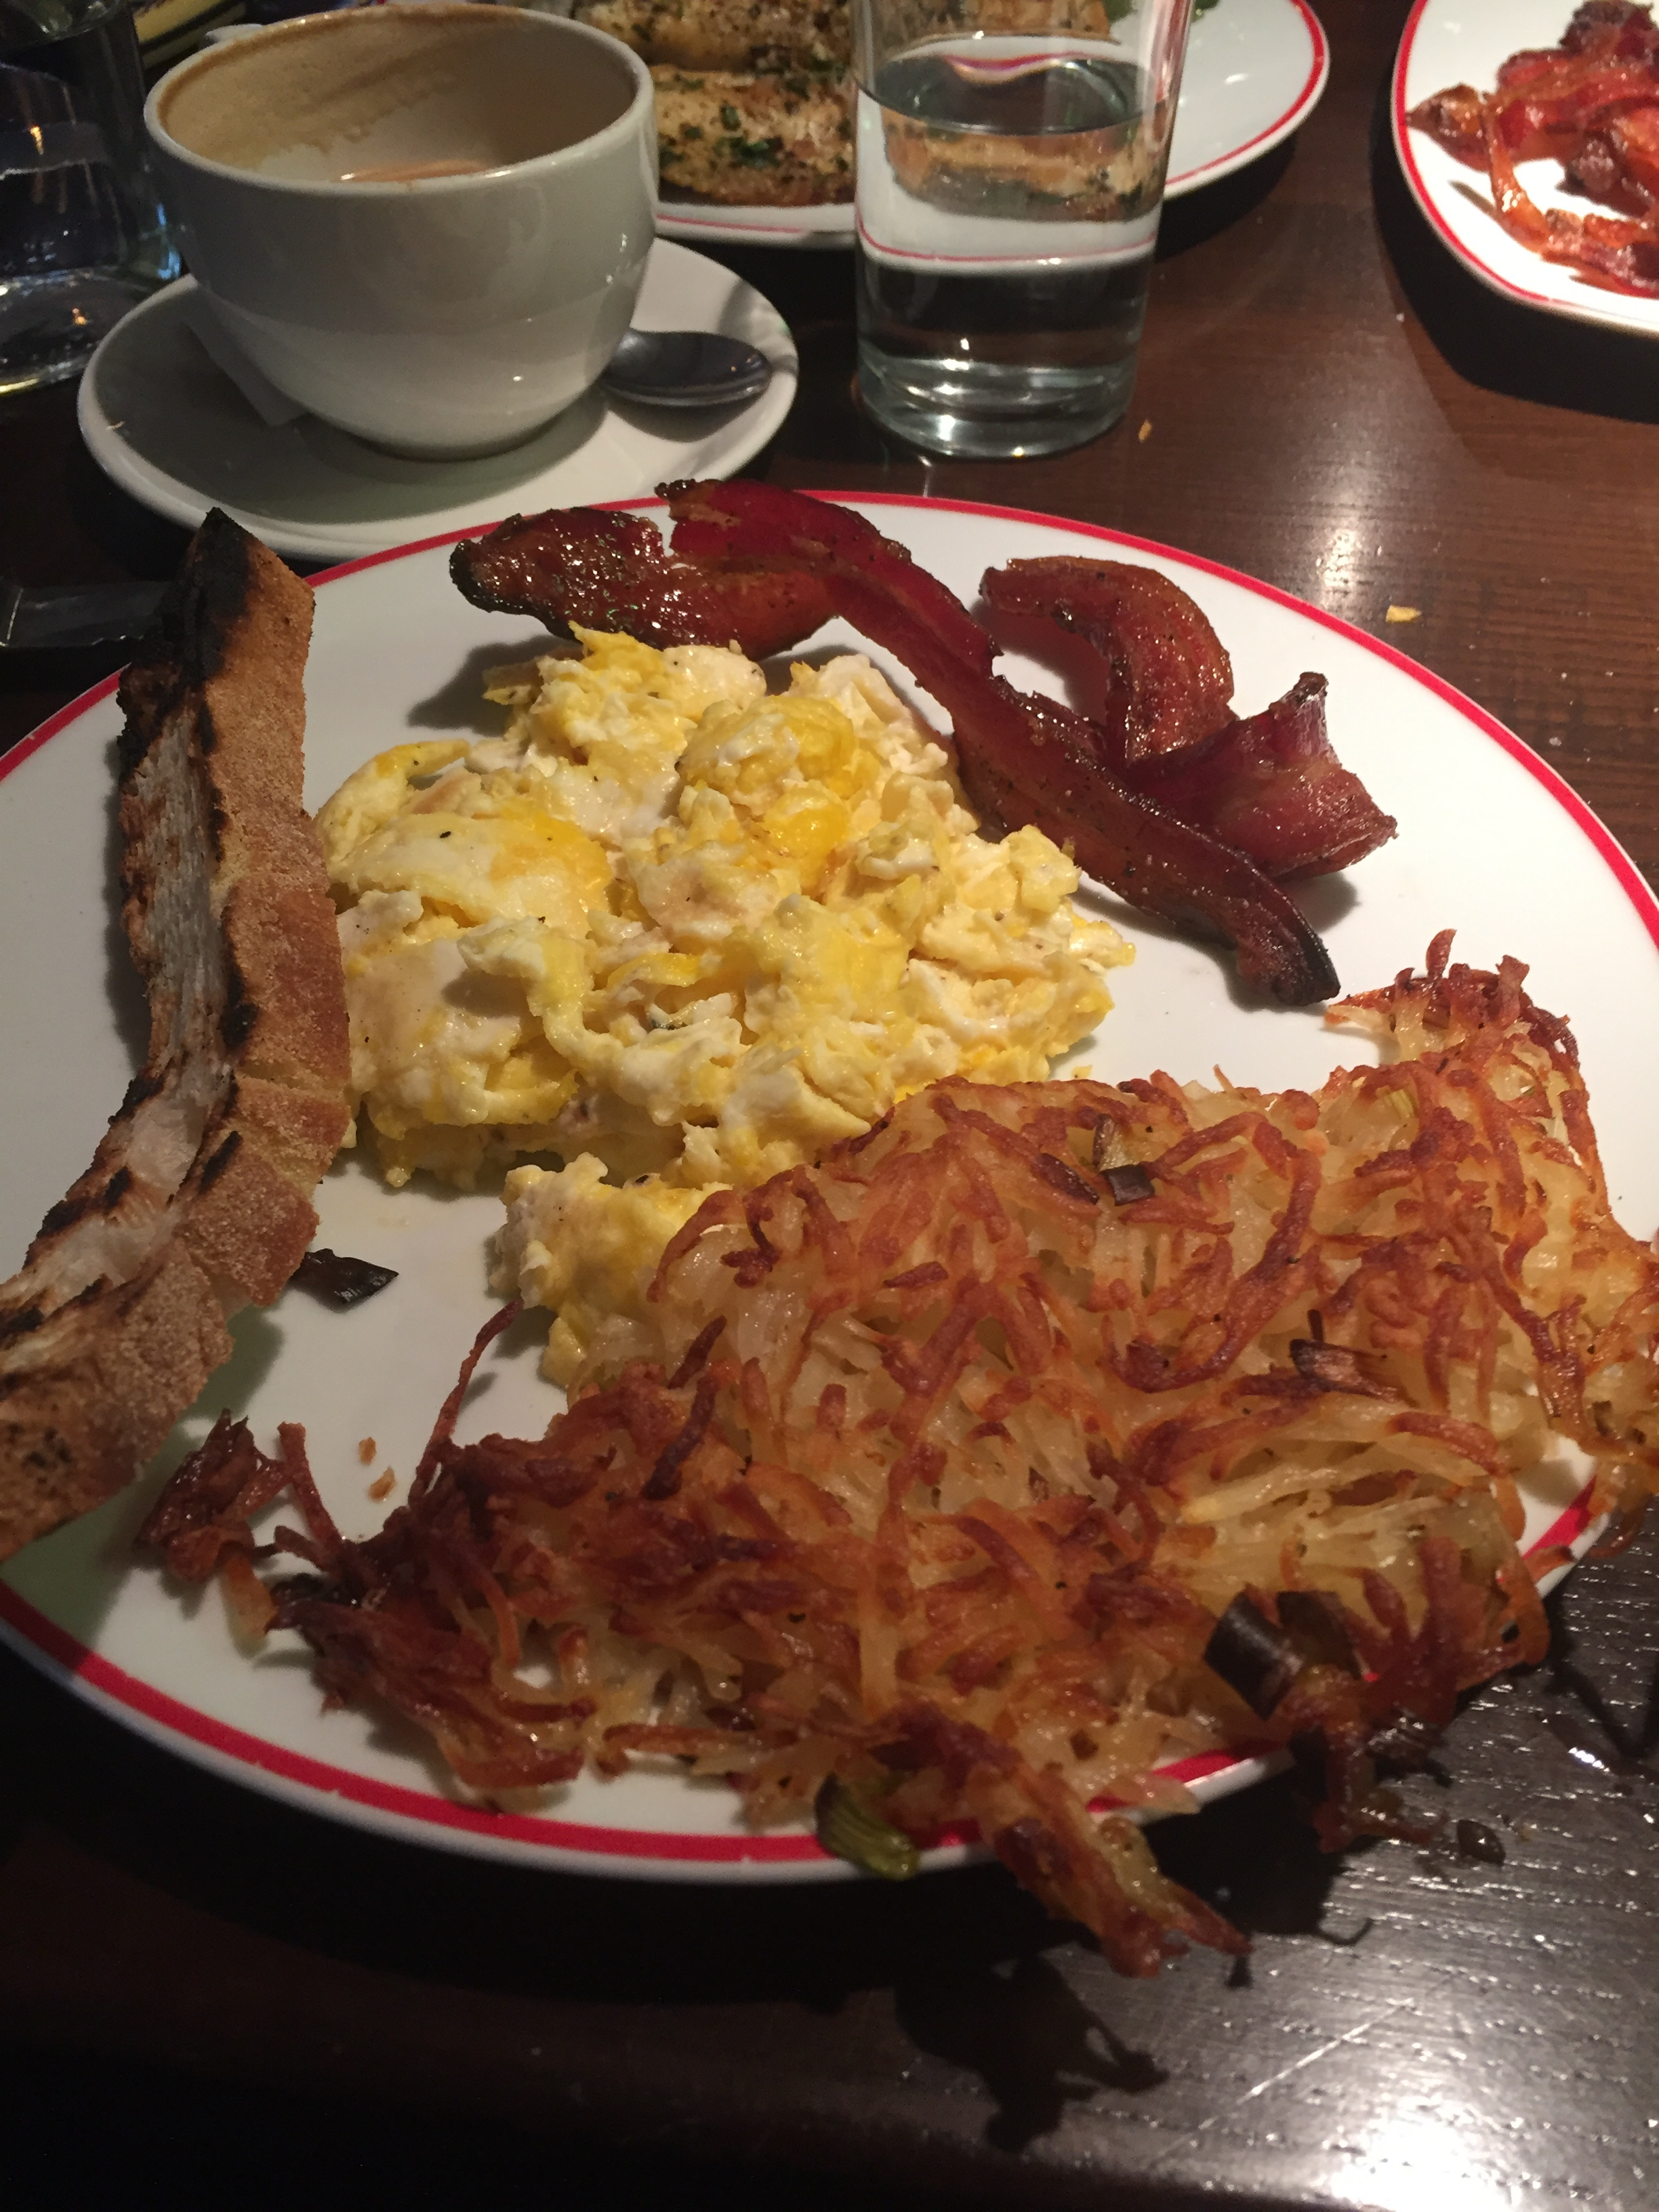 Founding Farmer's Breakfast